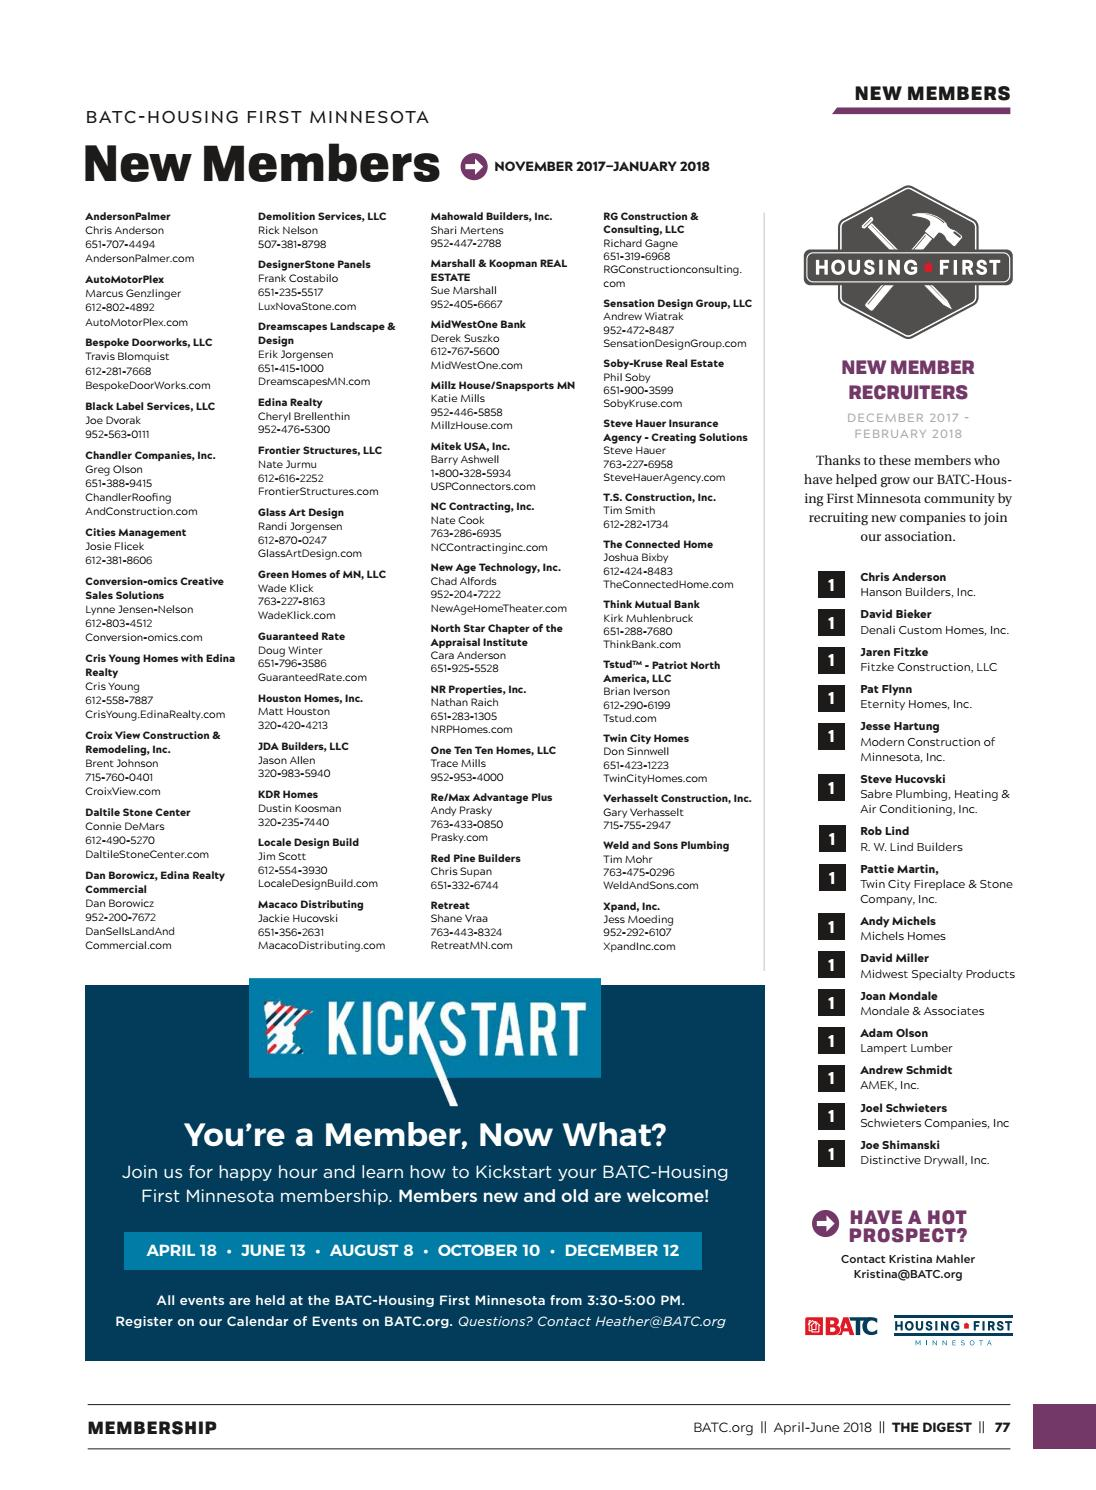 The Digest | April-June 2018 by BATC-Housing First Minnesota - issuu